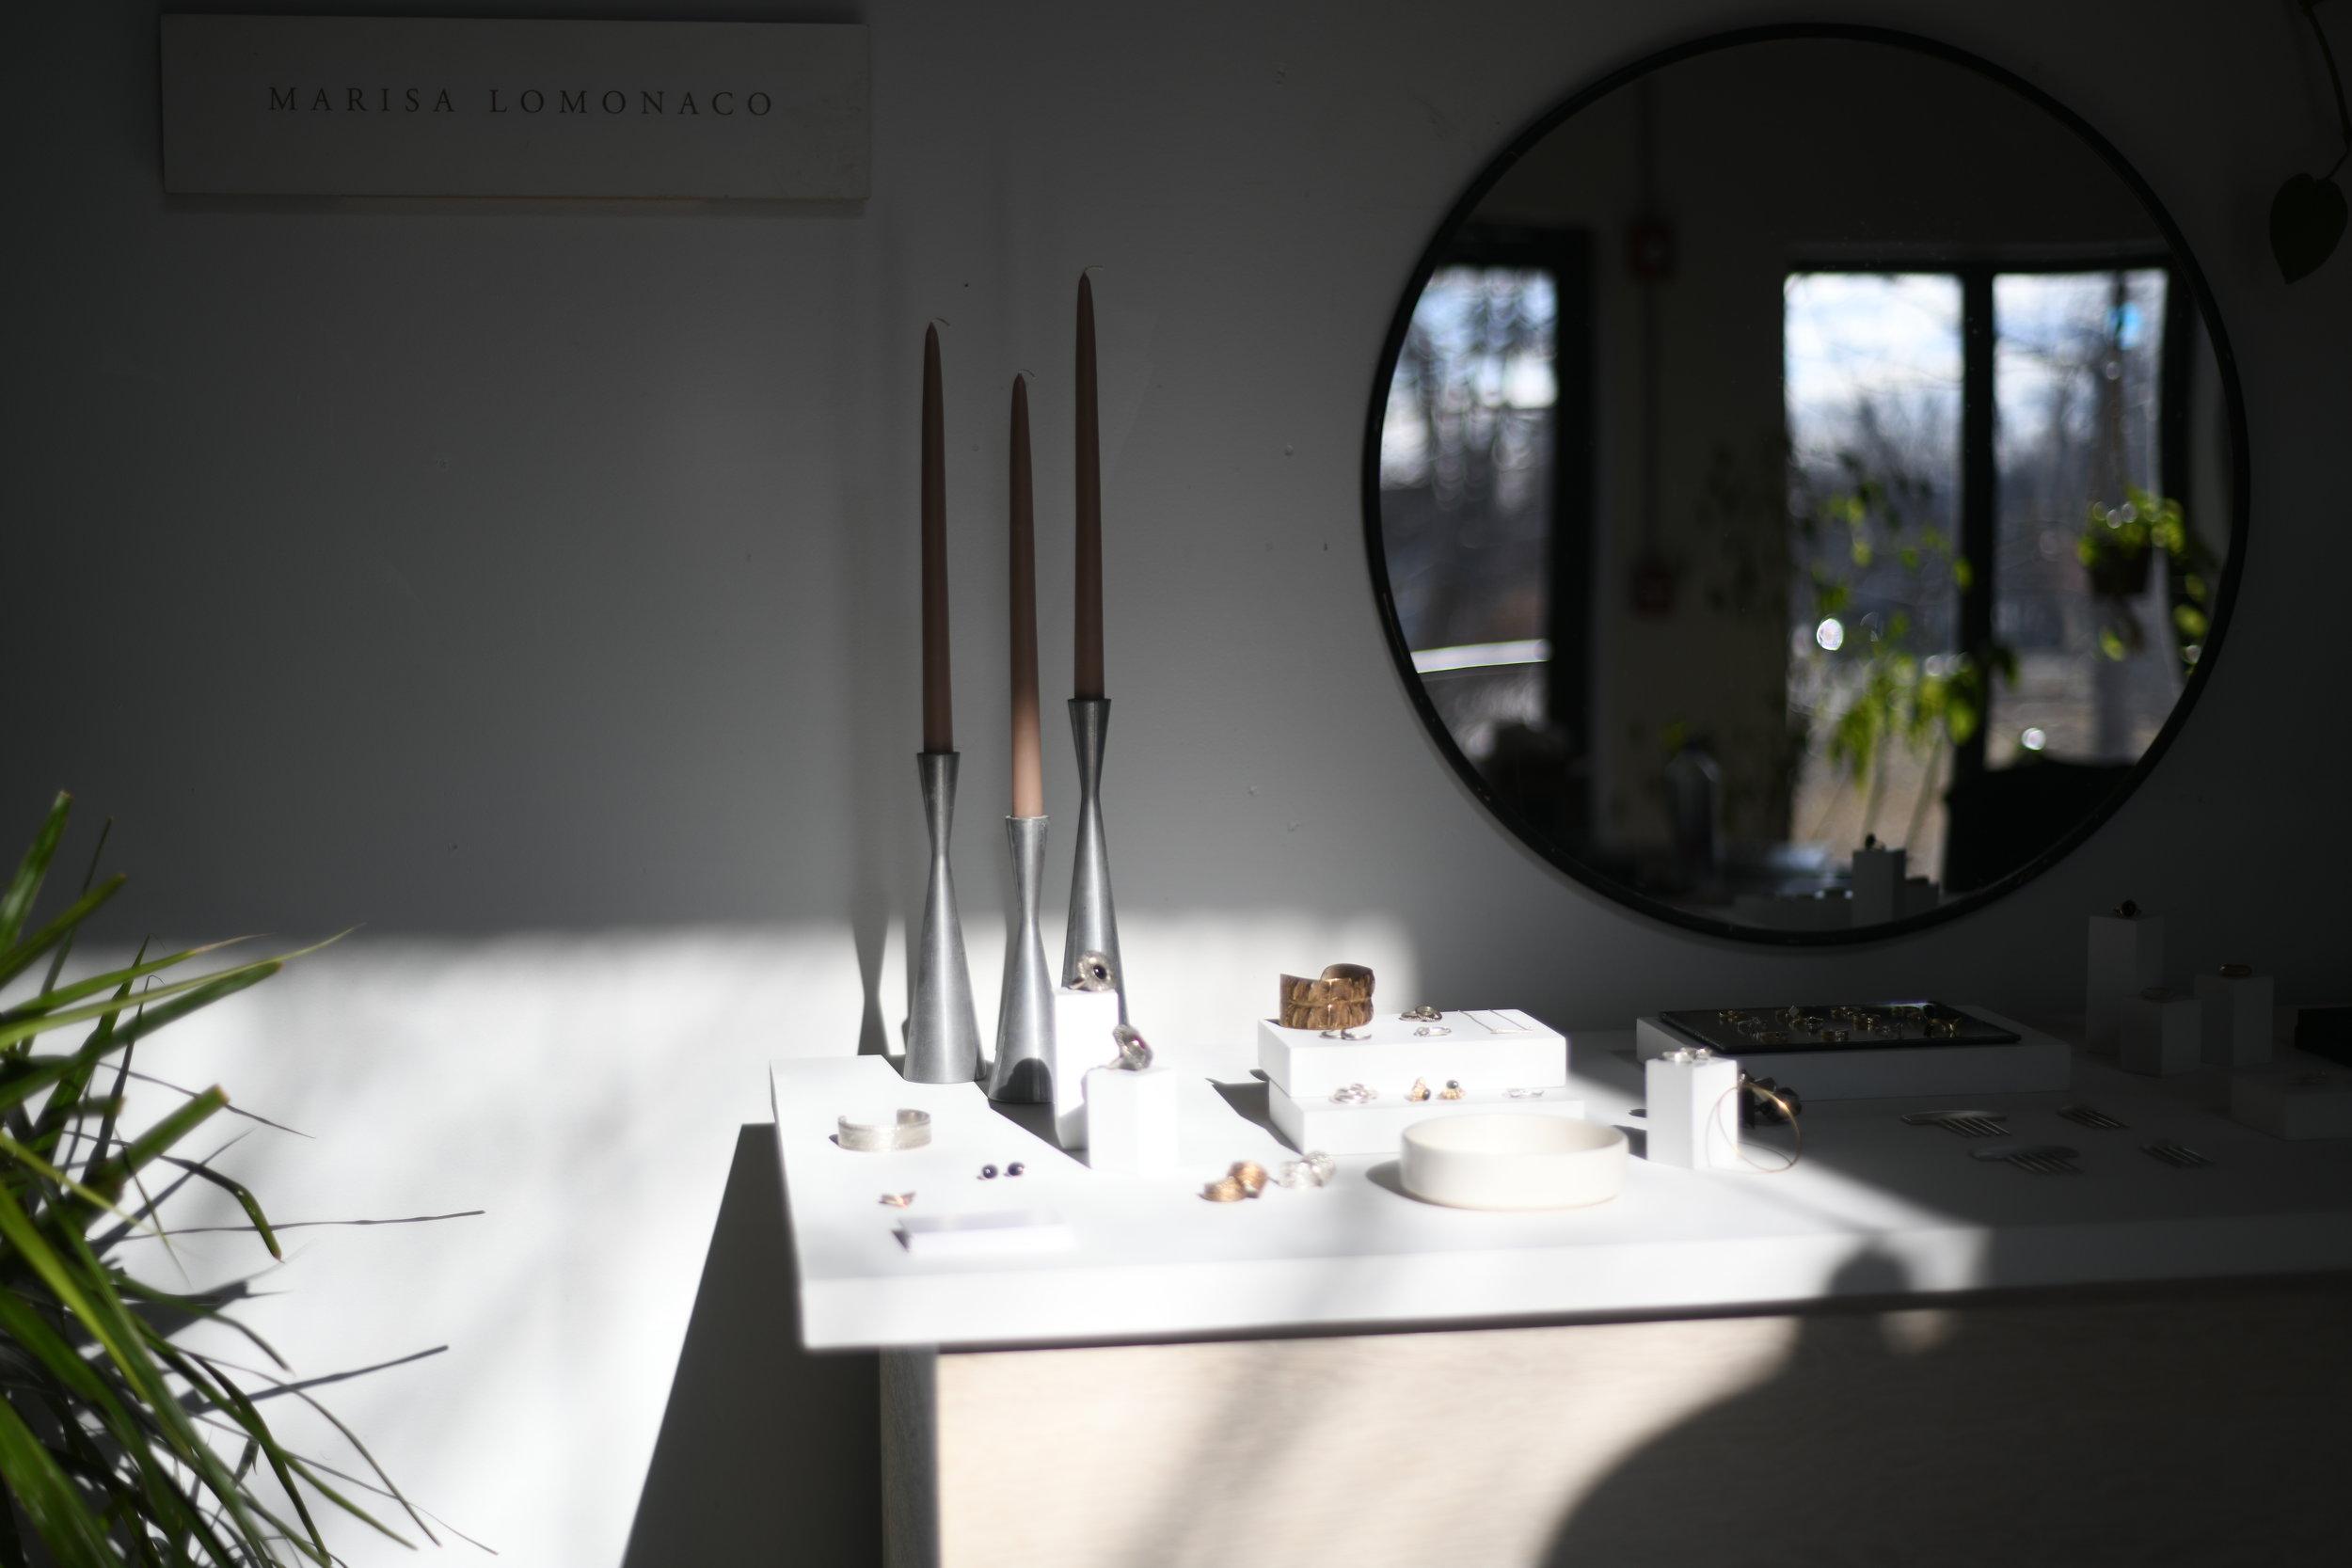 Marisa-Lomonaco-Custom-Jewelry-Beacon-NY-Studio12.JPG